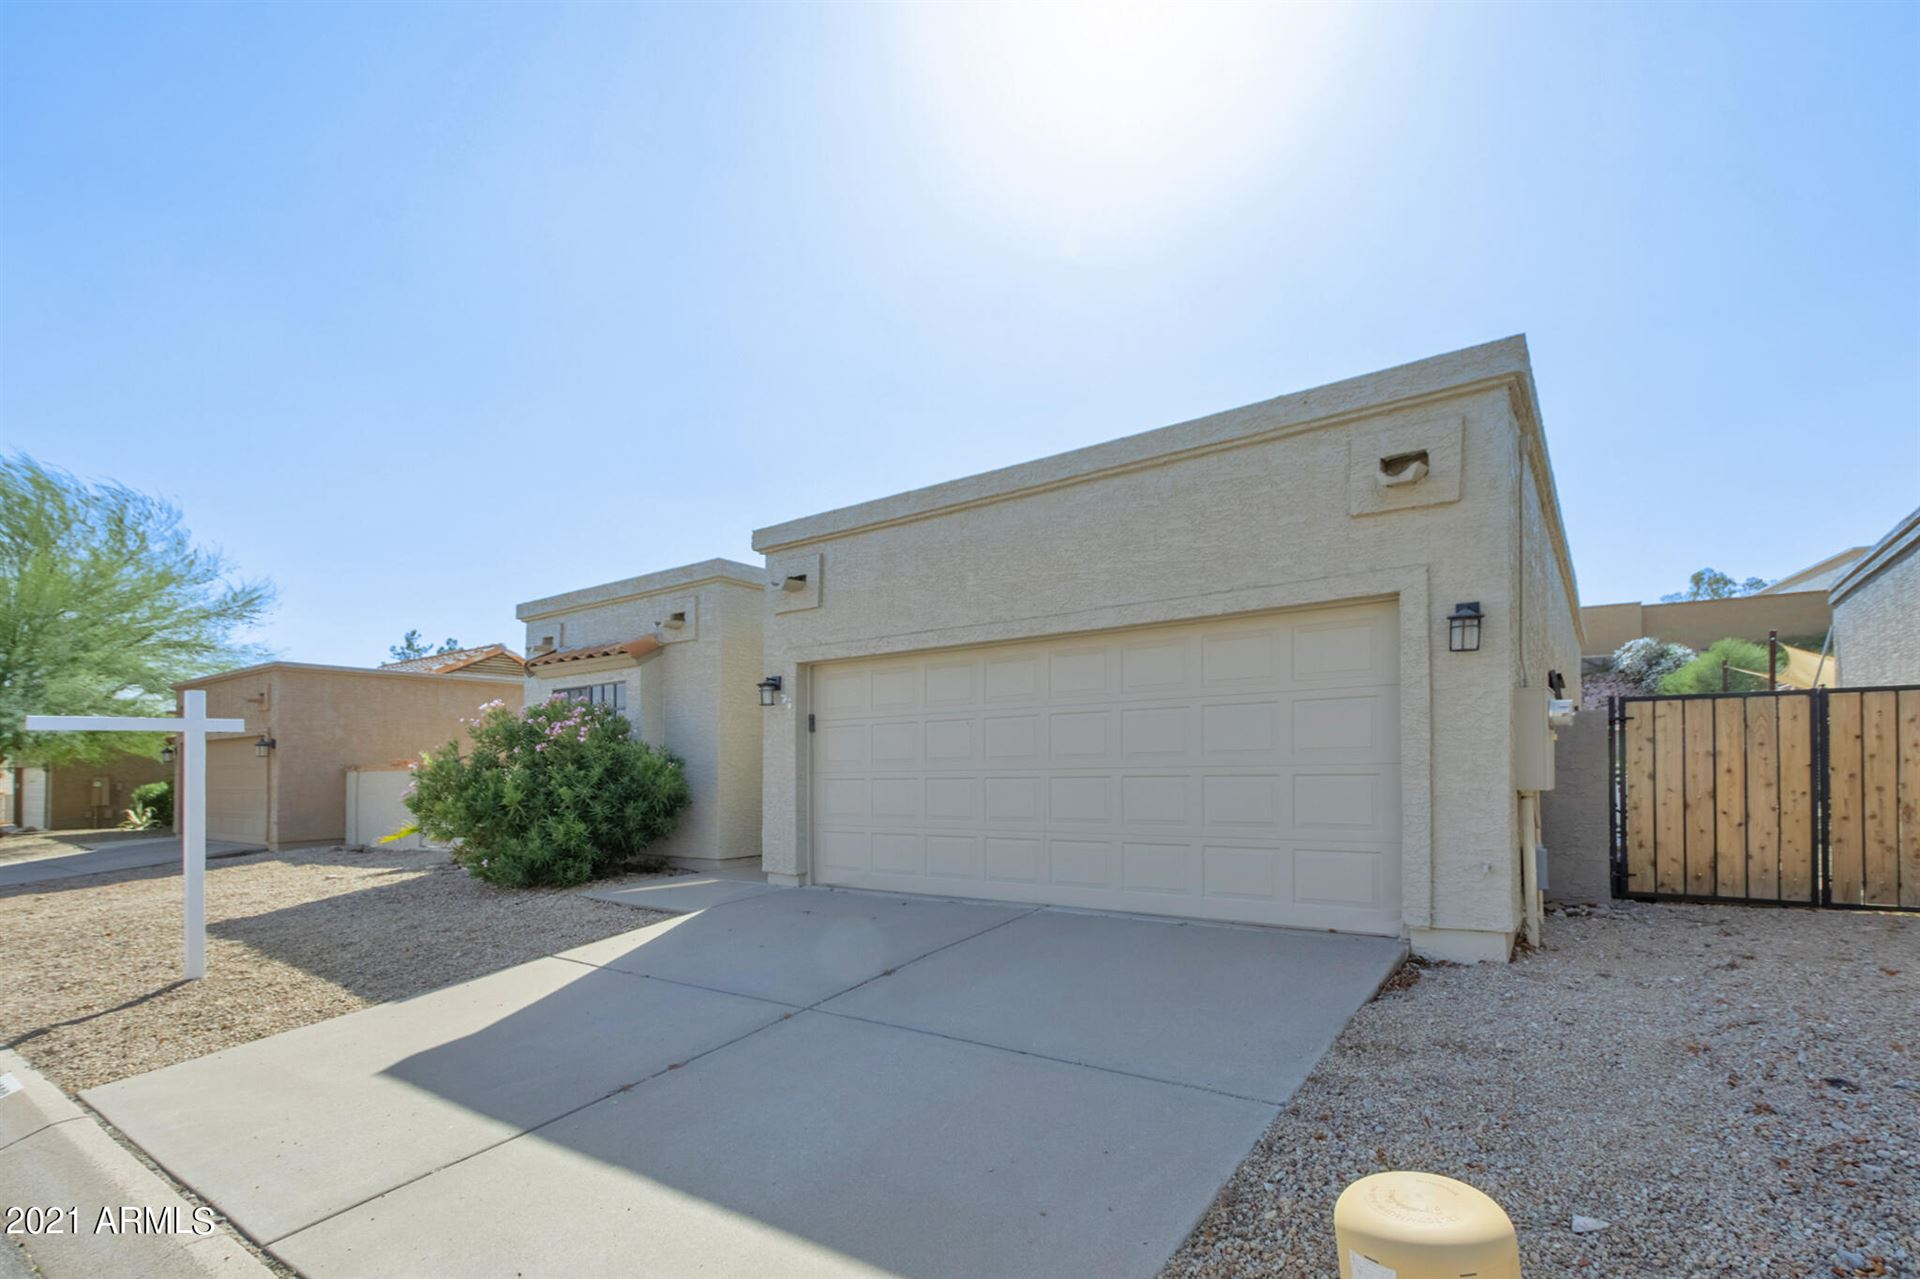 Photo of 14638 N OLYMPIC Way, Fountain Hills, AZ 85268 (MLS # 6307349)